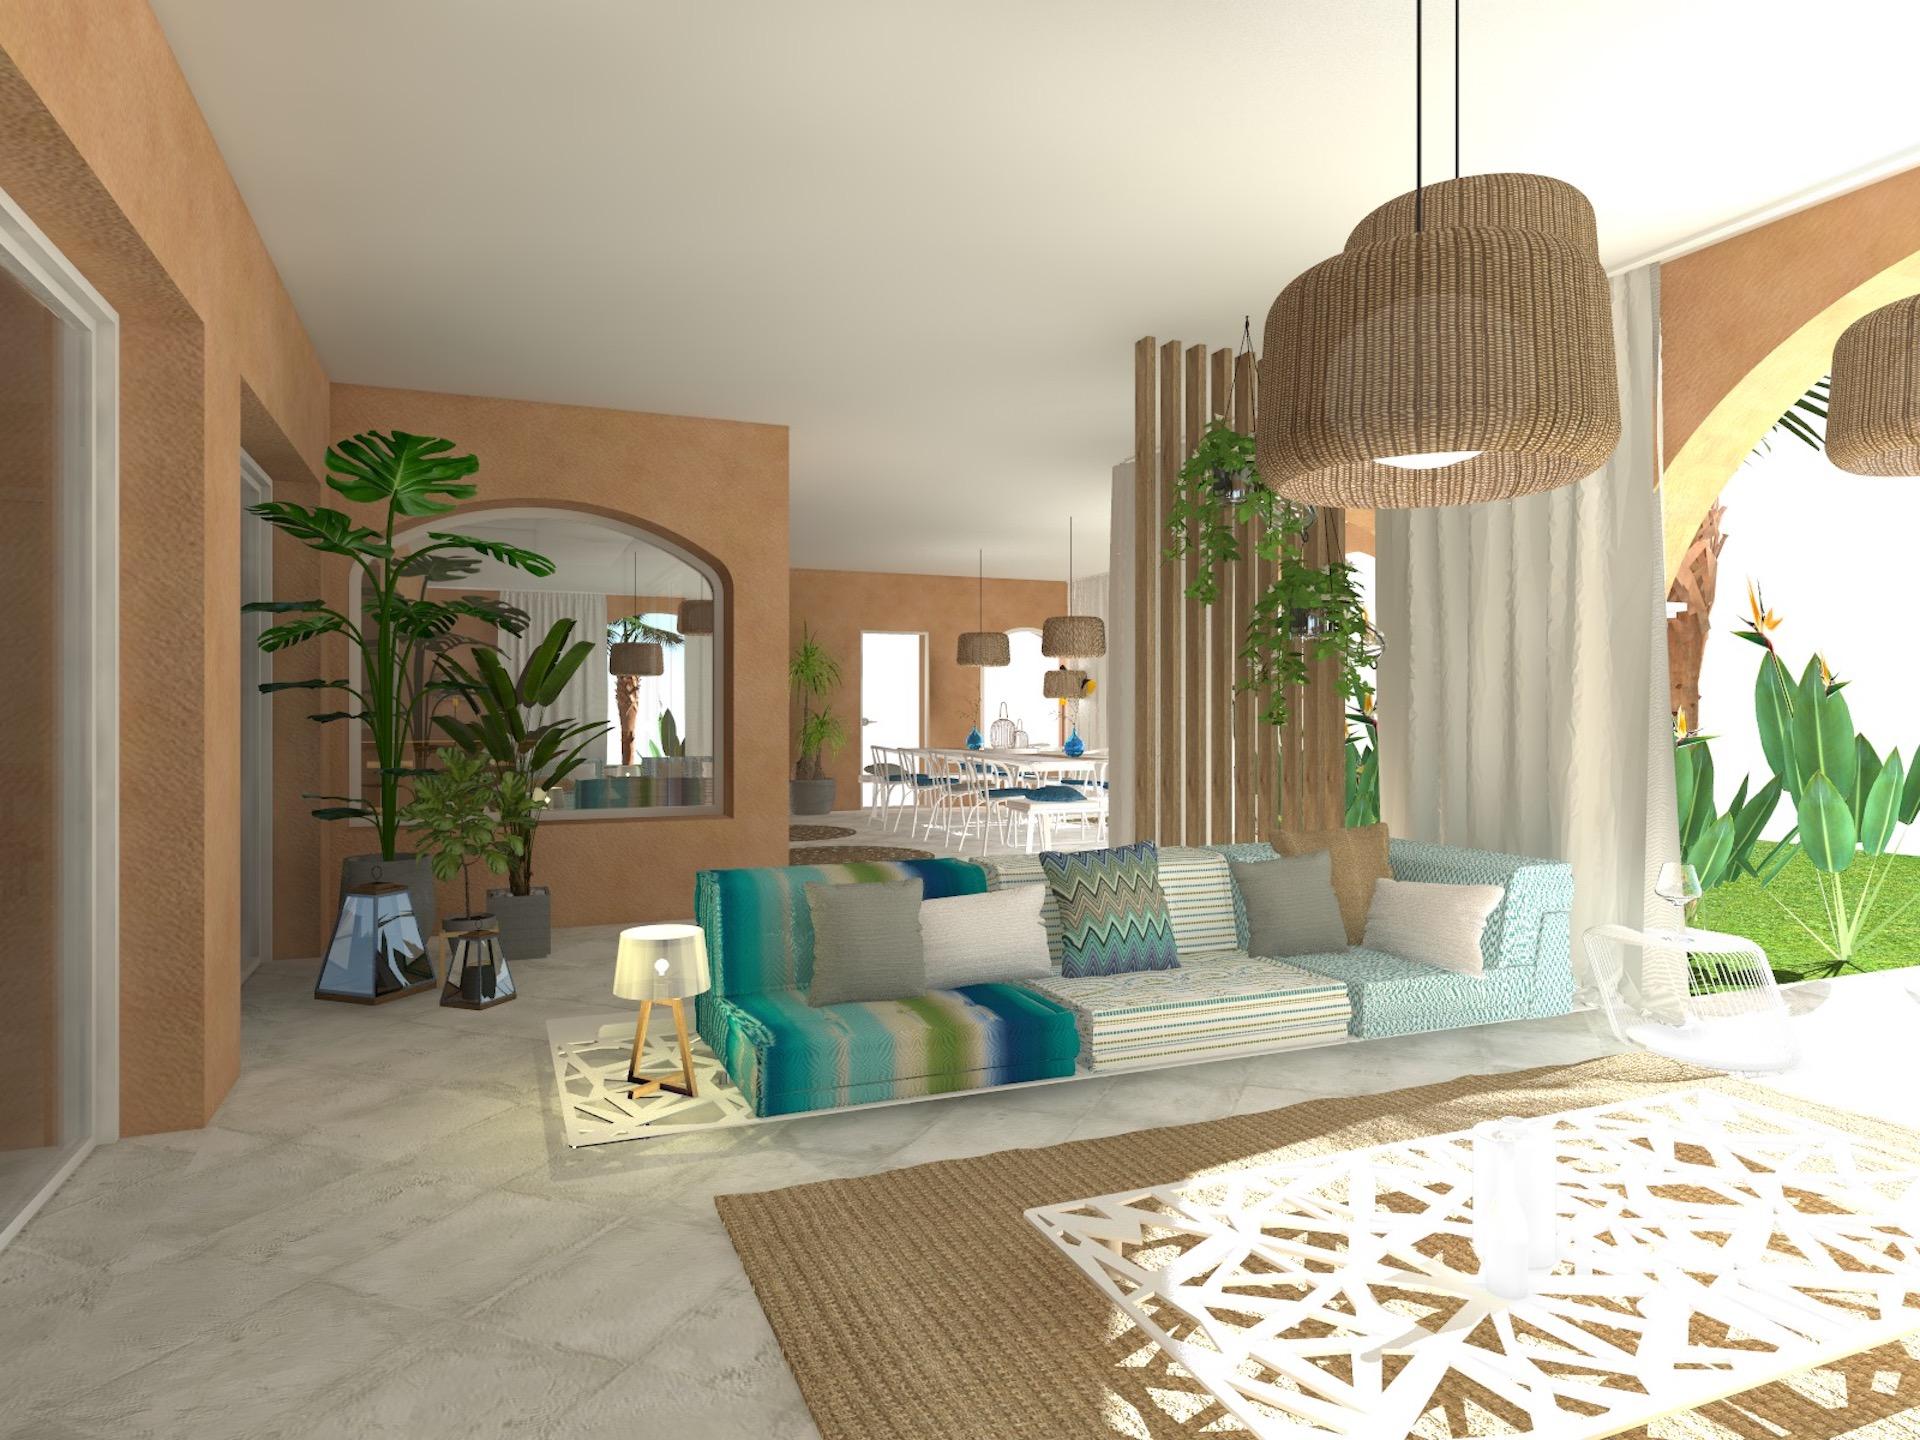 renovation villa luxe semaphore sainte-maxime var architecture interieure29